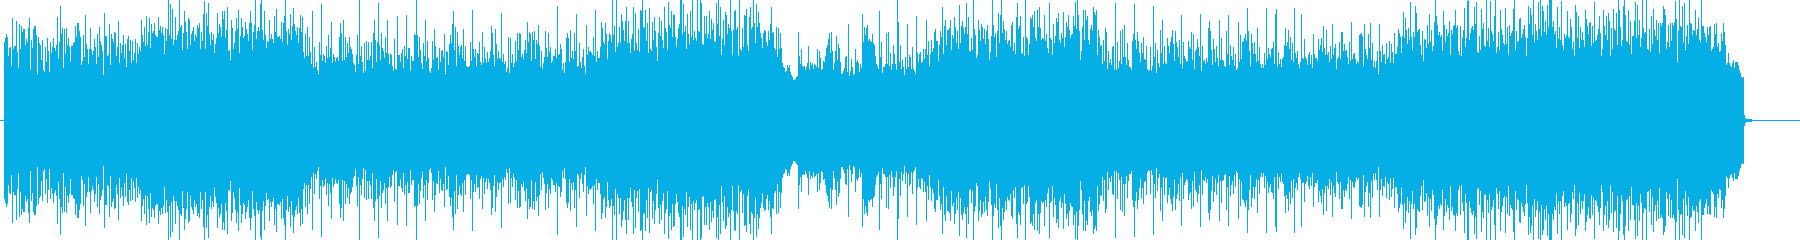 「HR/HM」「ROCK」BGM145の再生済みの波形